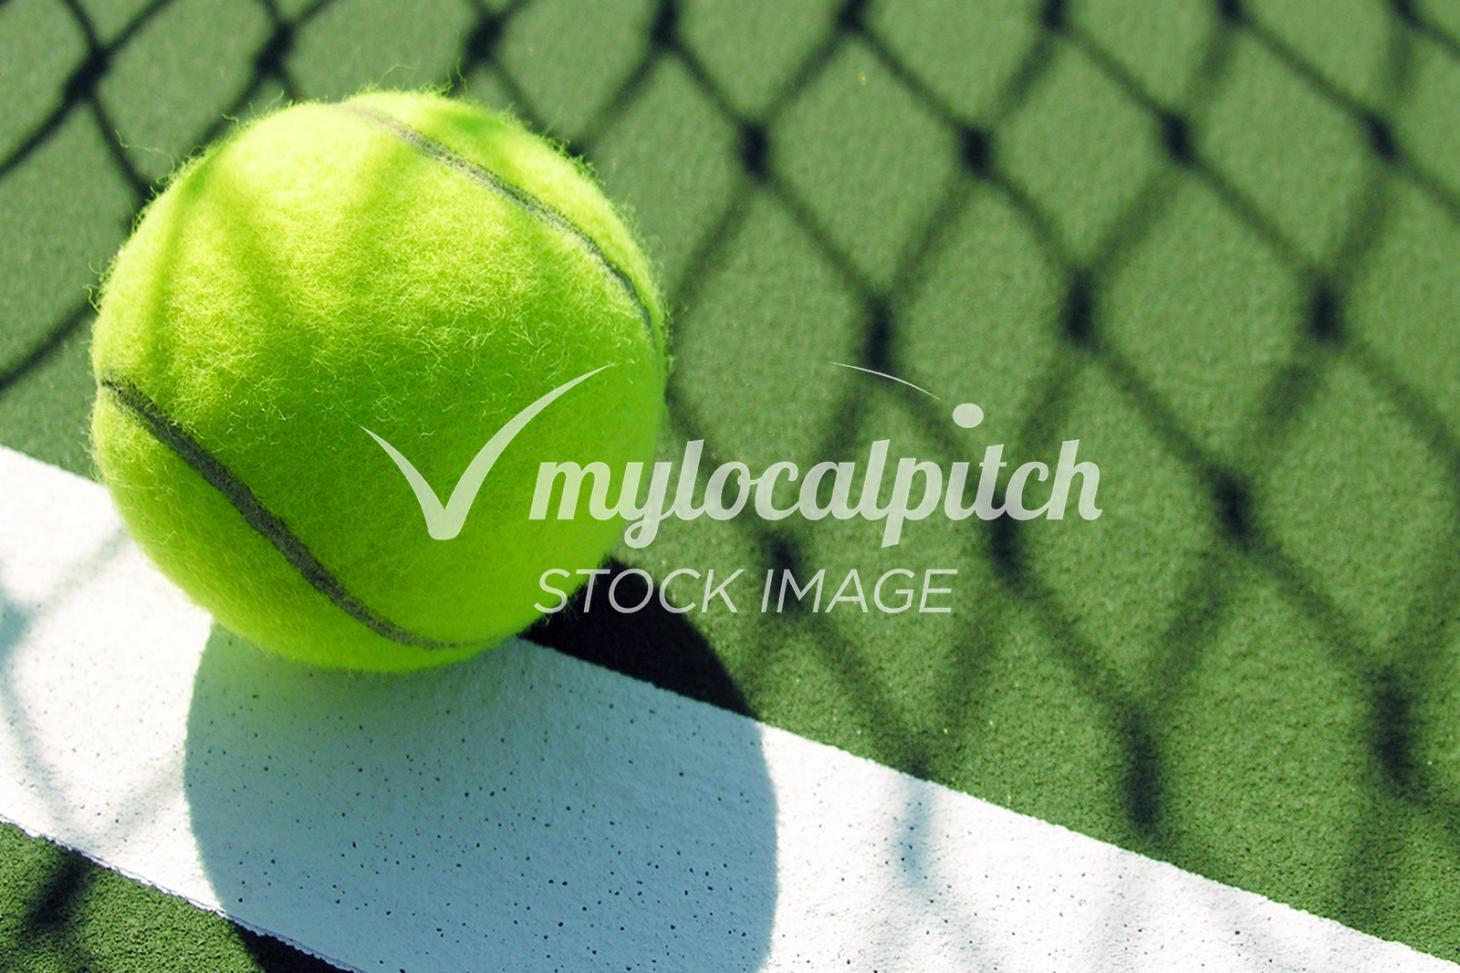 Hogarth Health Club Outdoor   Hard (macadam) tennis court